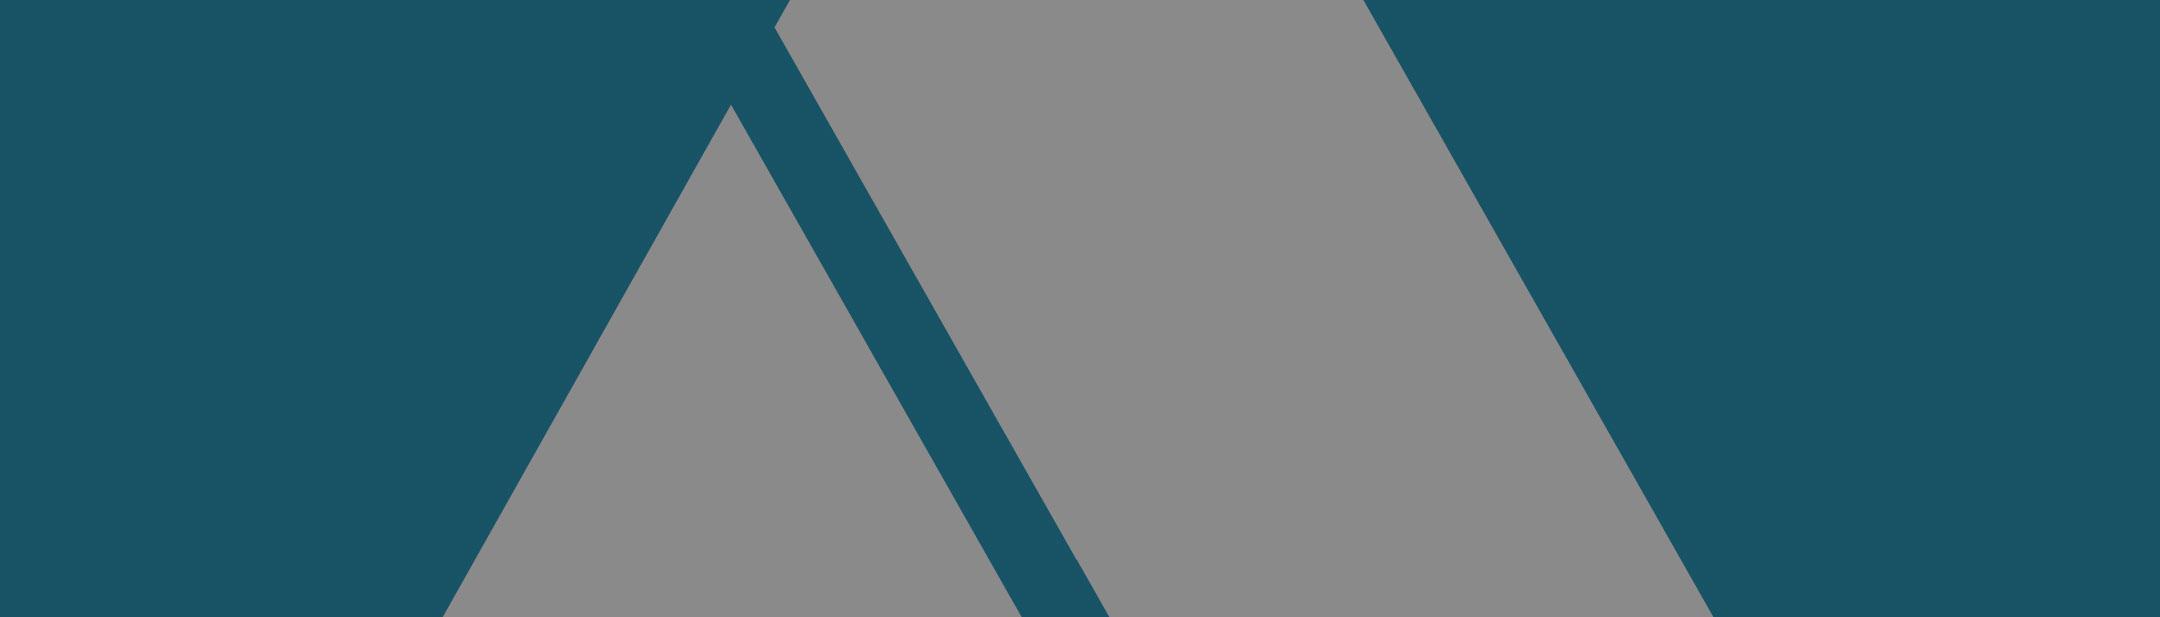 About Agilon Digital